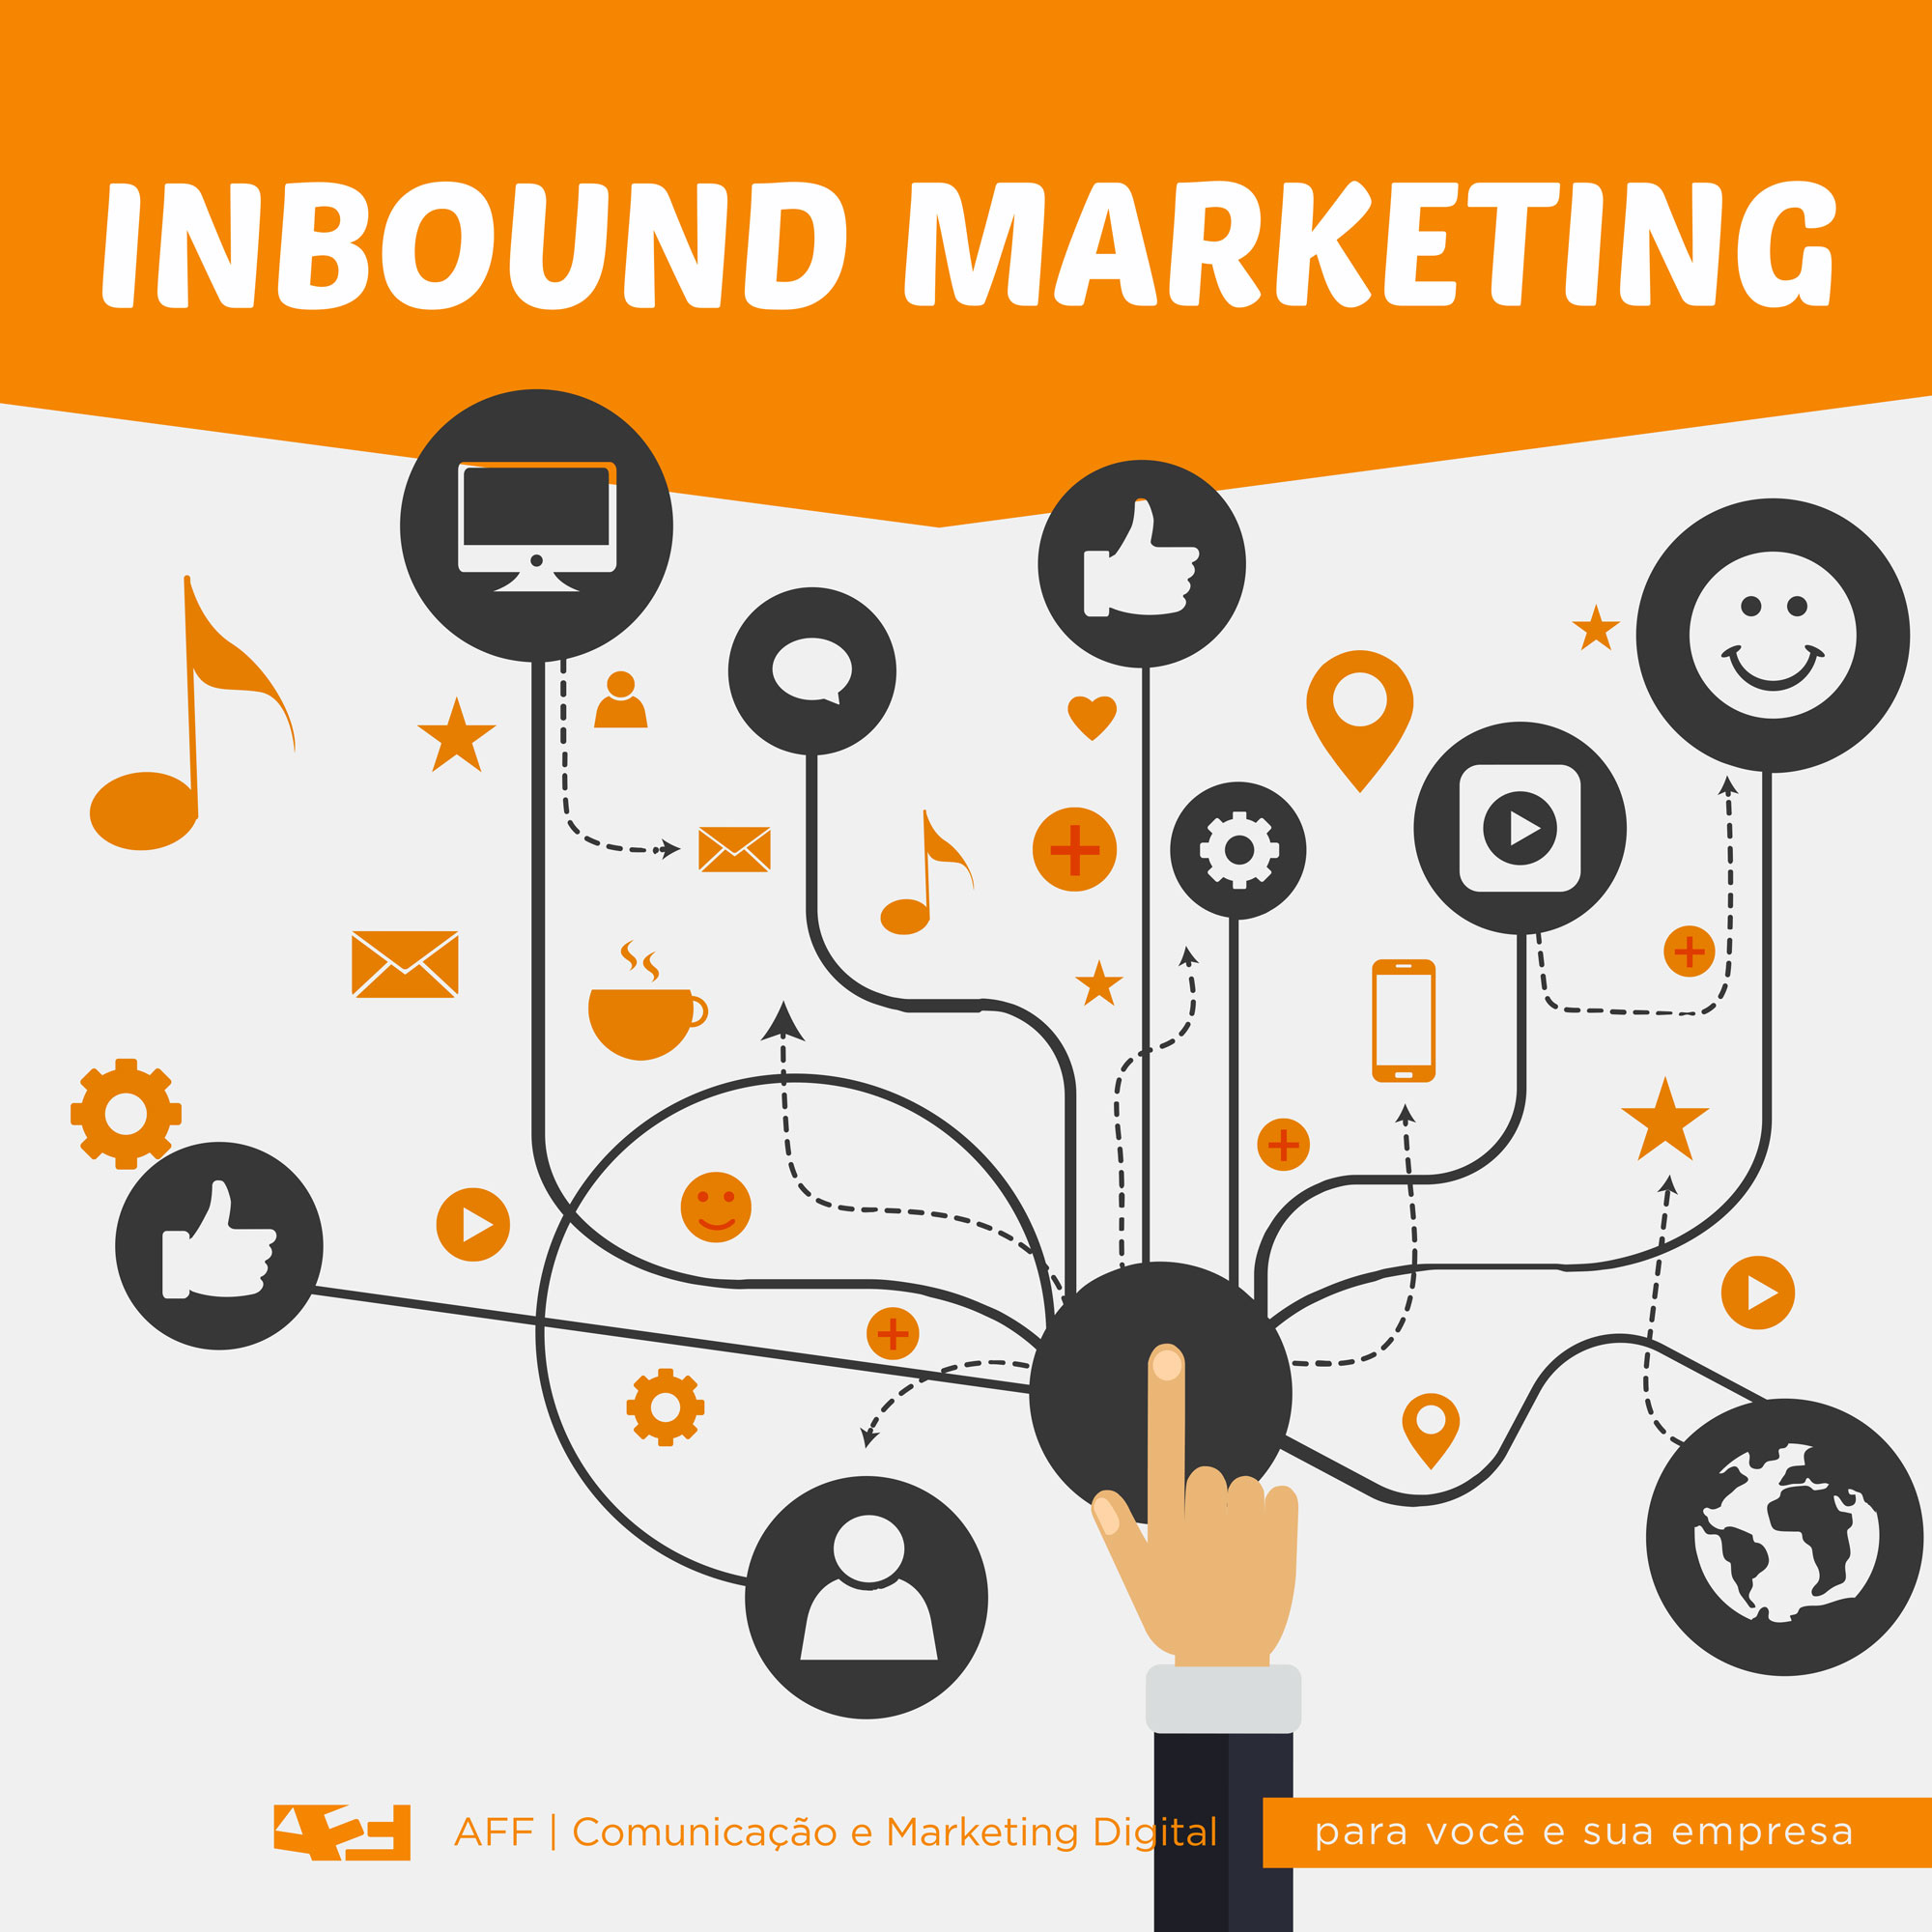 Inbound marketing, imagem meramente ilustrativa